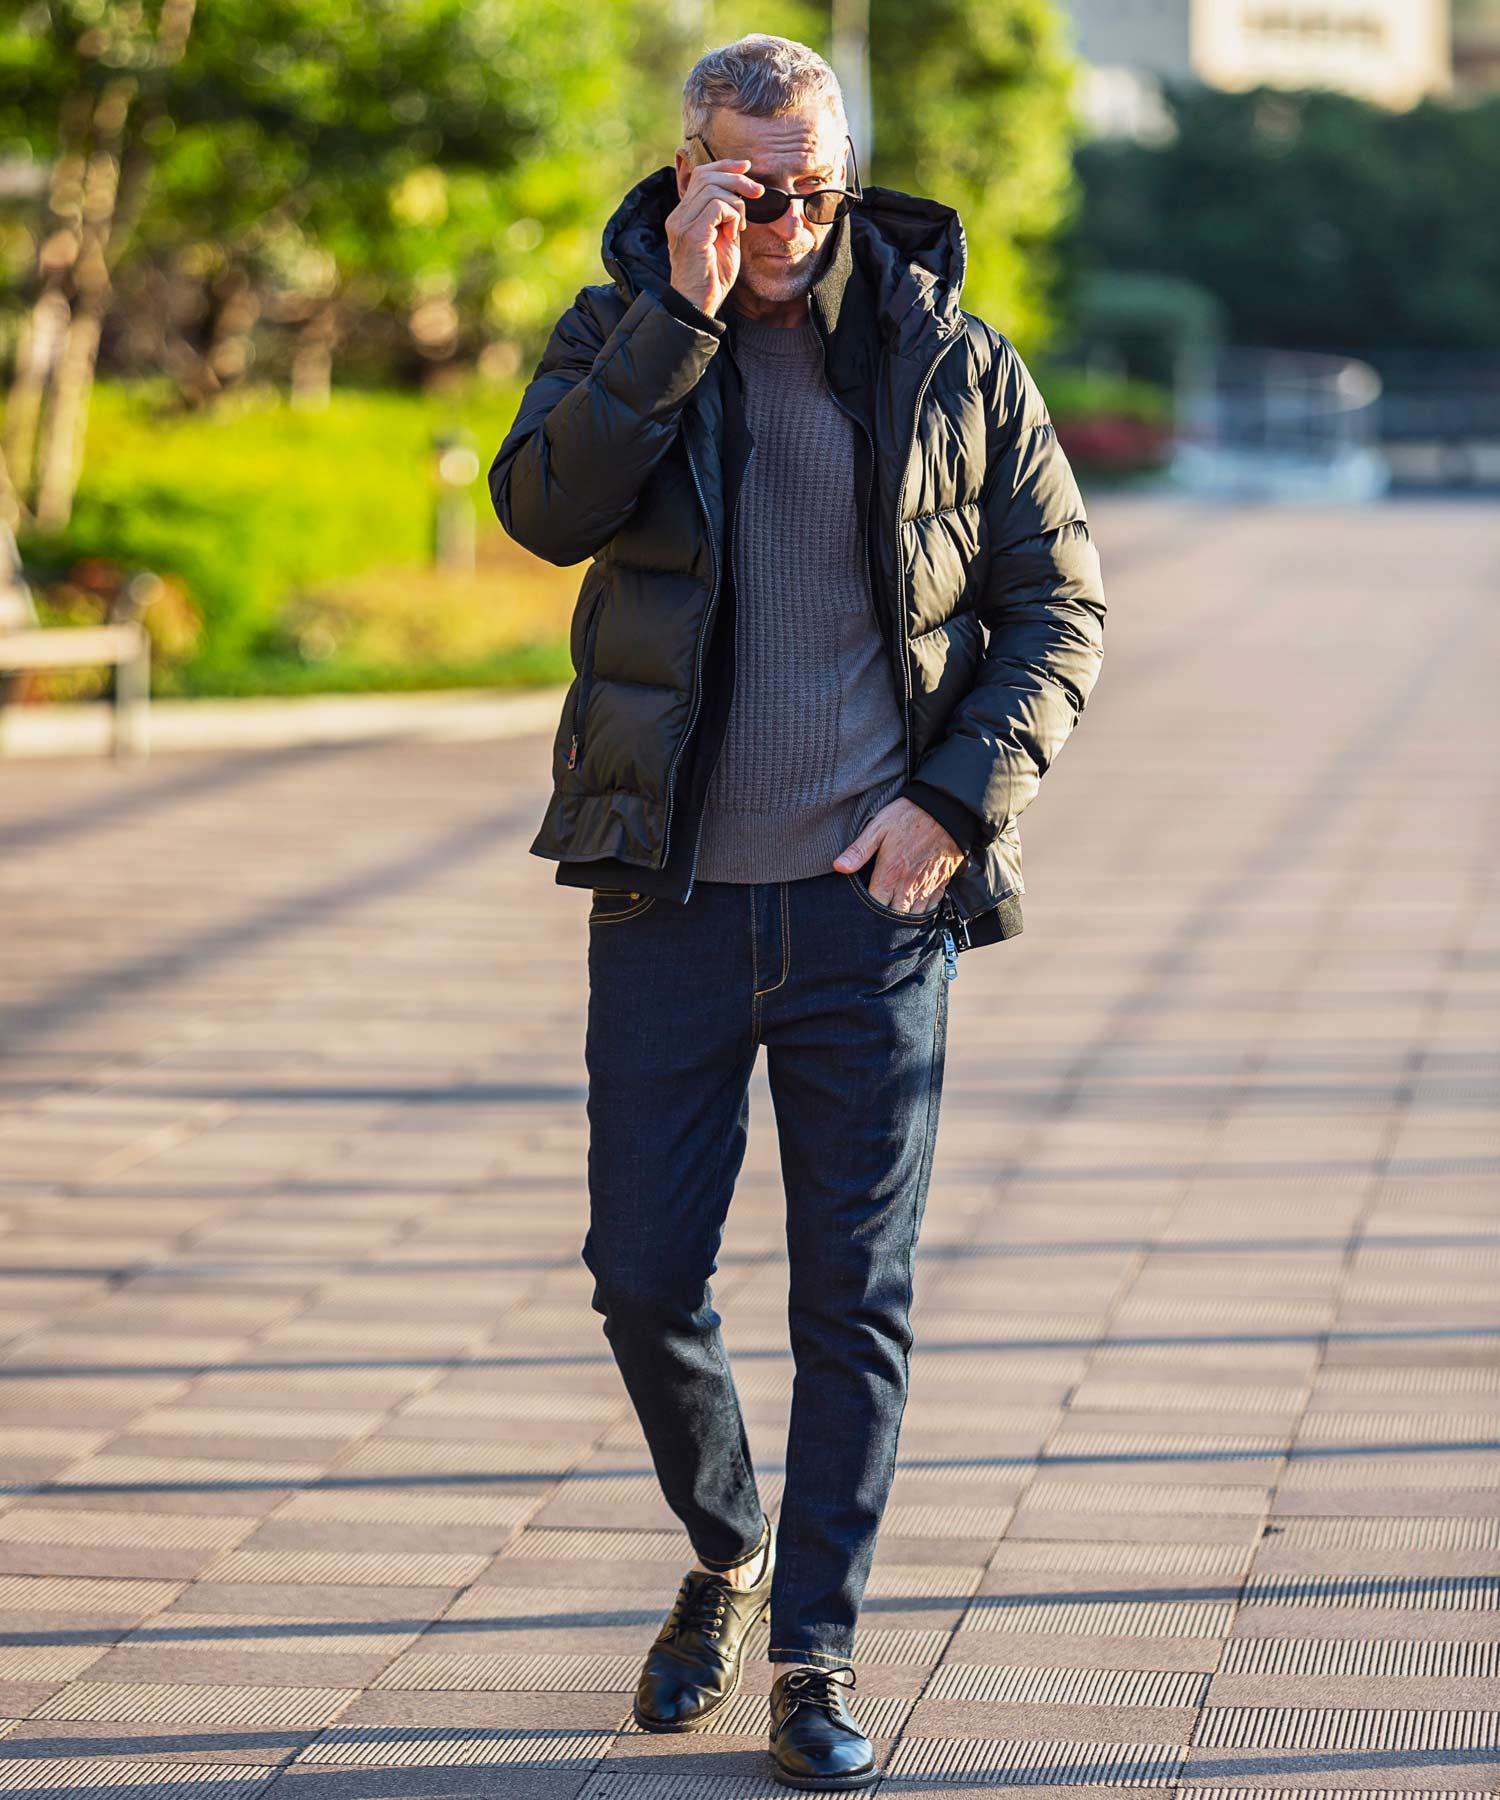 style_6